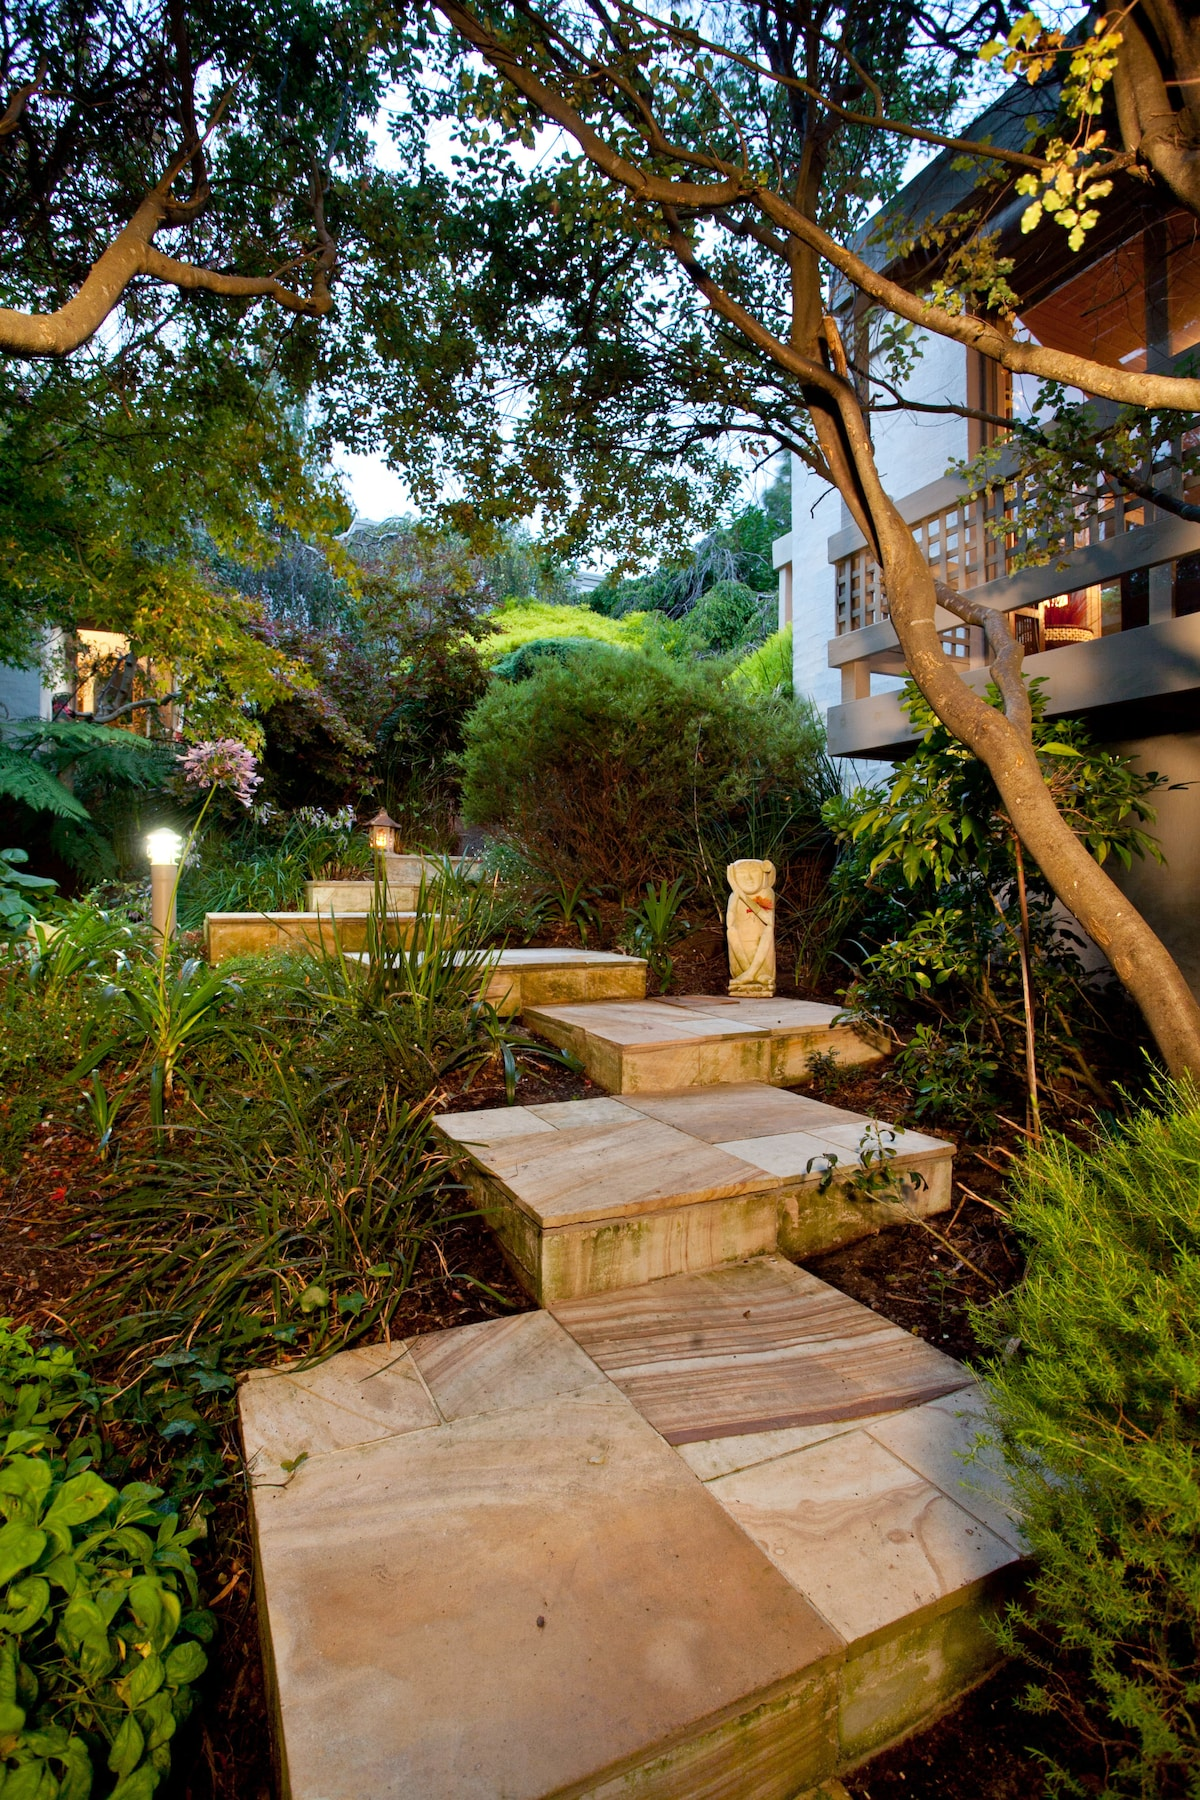 Eden on the Hill - Park Apartment